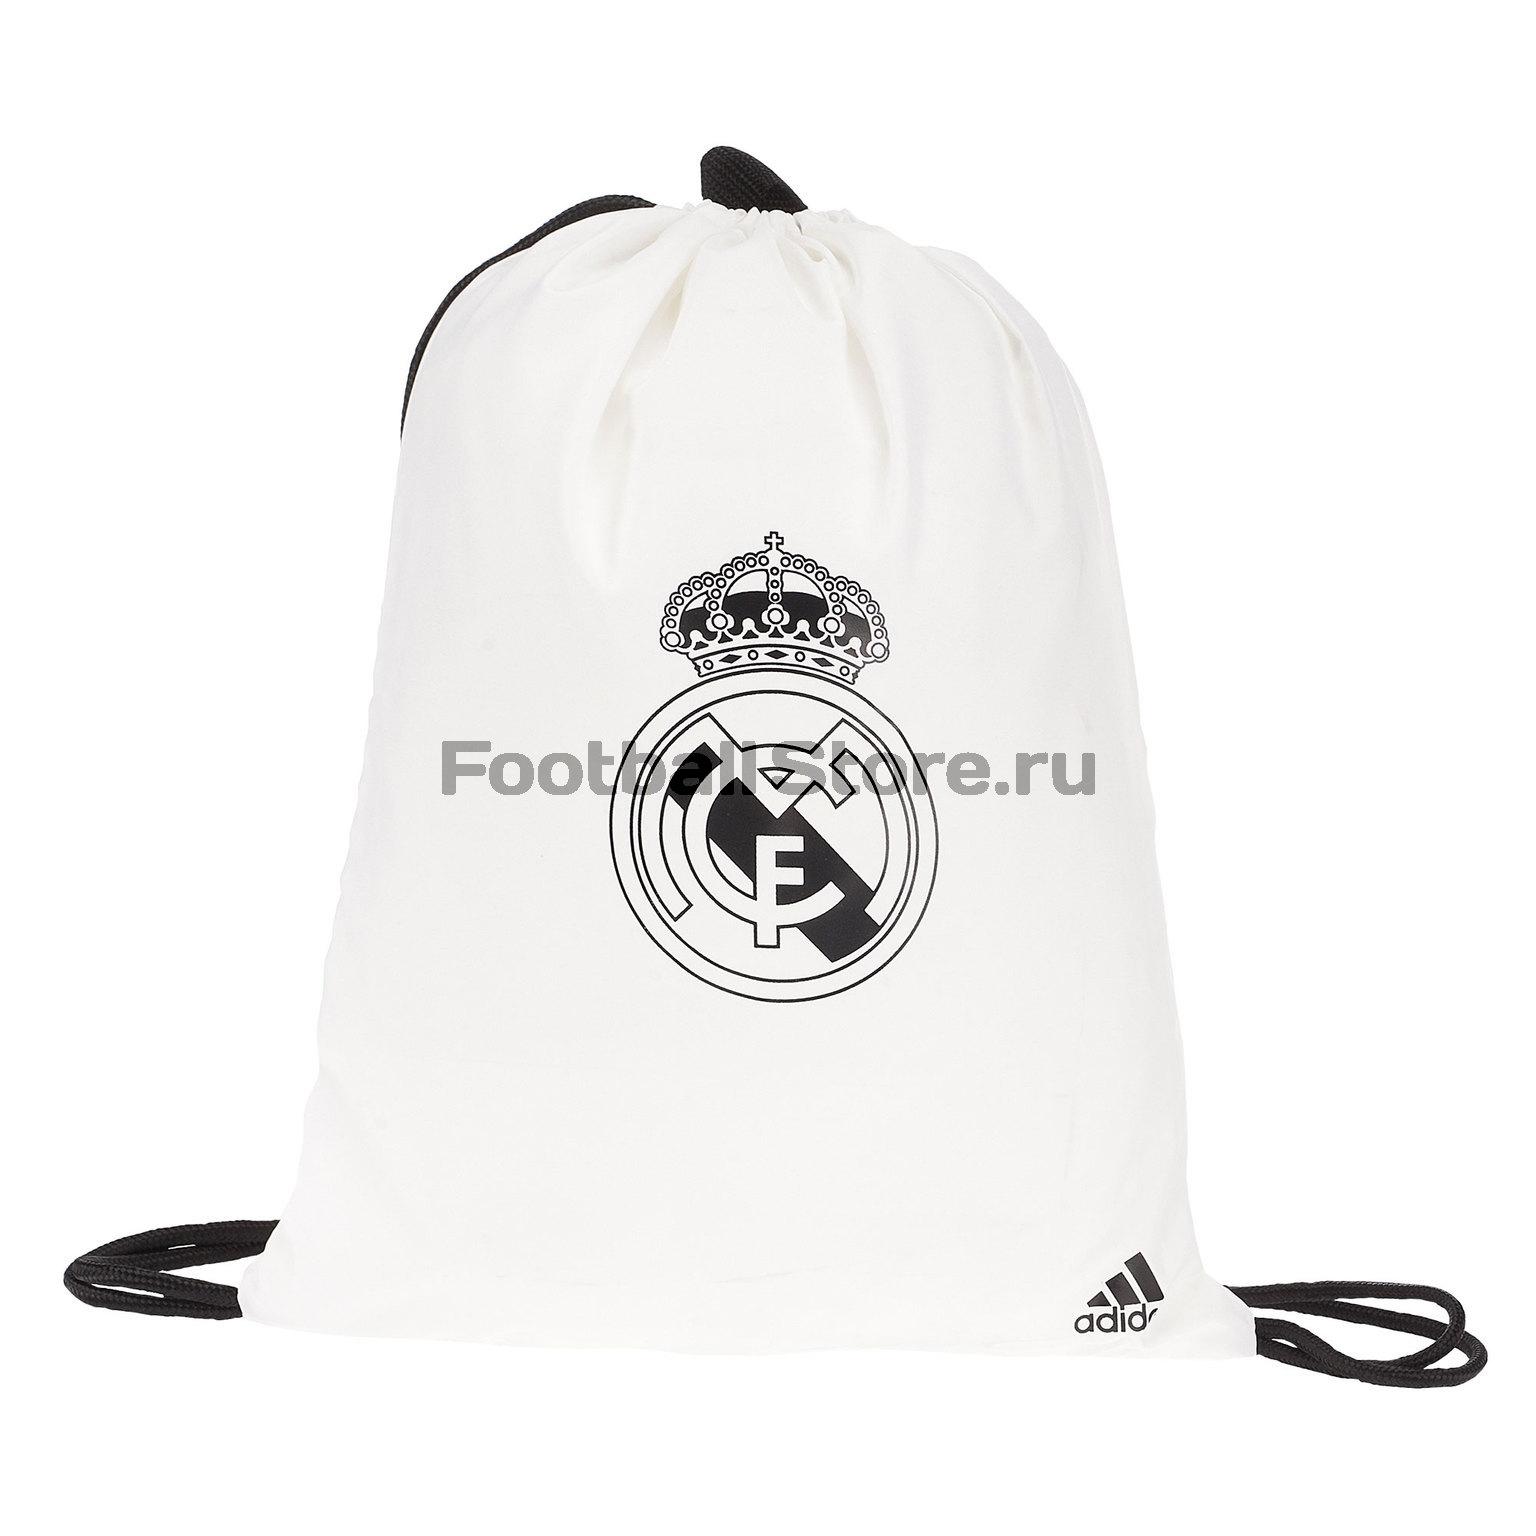 Сумка для обуви Adidas Real Madrid 2018/19